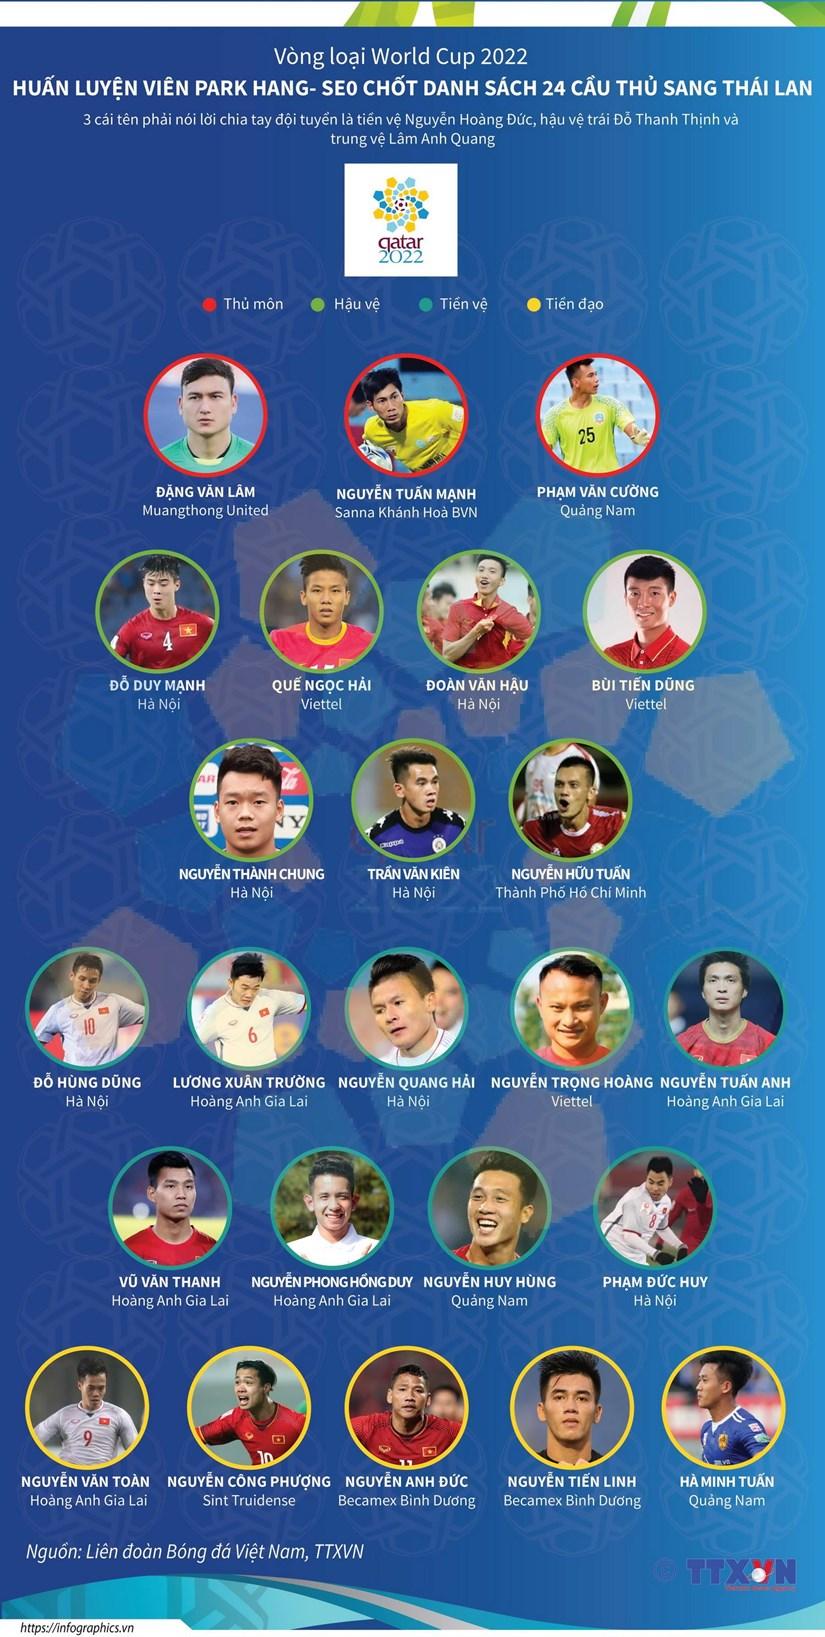 Chan dung 24 tuyen thu Viet Nam sang Thai Lan da vong loai World Cup hinh anh 1